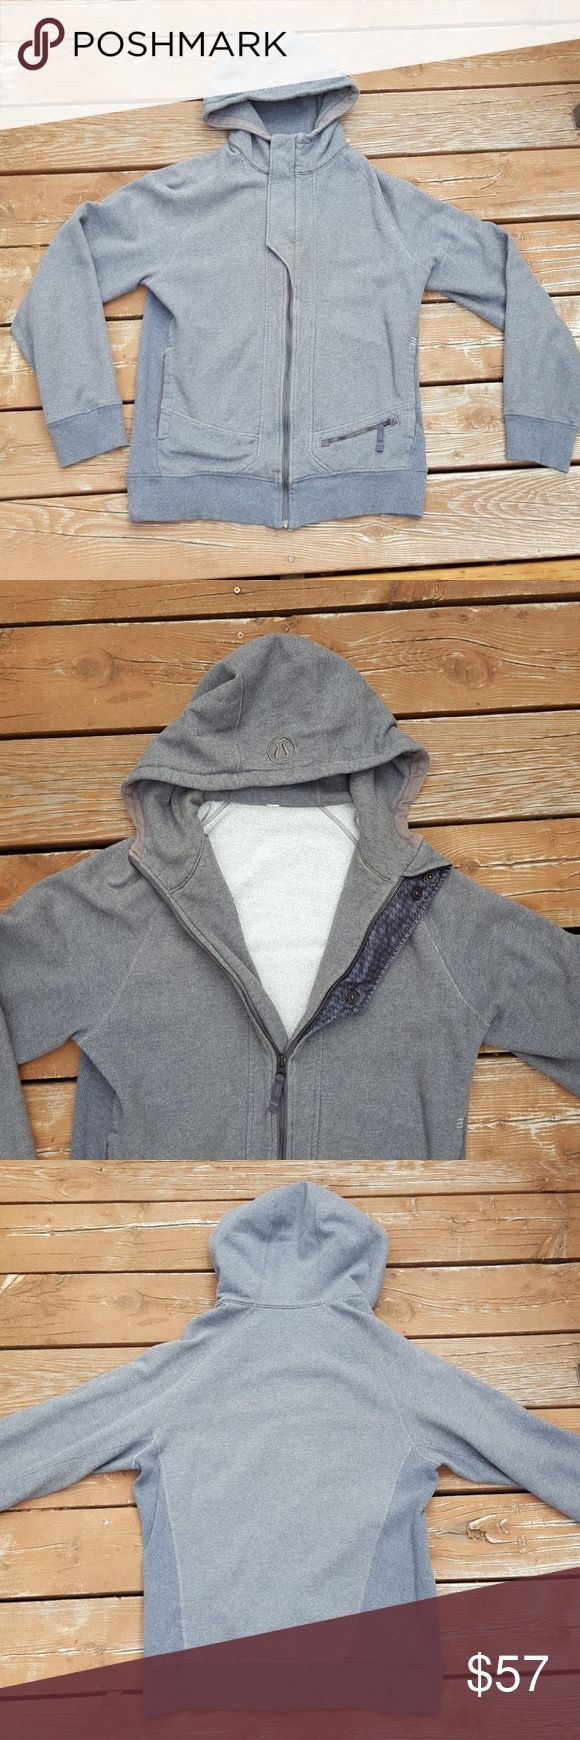 Lululemon Gray Zip Up Hoodie Lululemon  Men's Gray Zip Up Hoodie  Size M  3 Front Pockets Fair Condition lululemon athletica Sweaters Zip Up